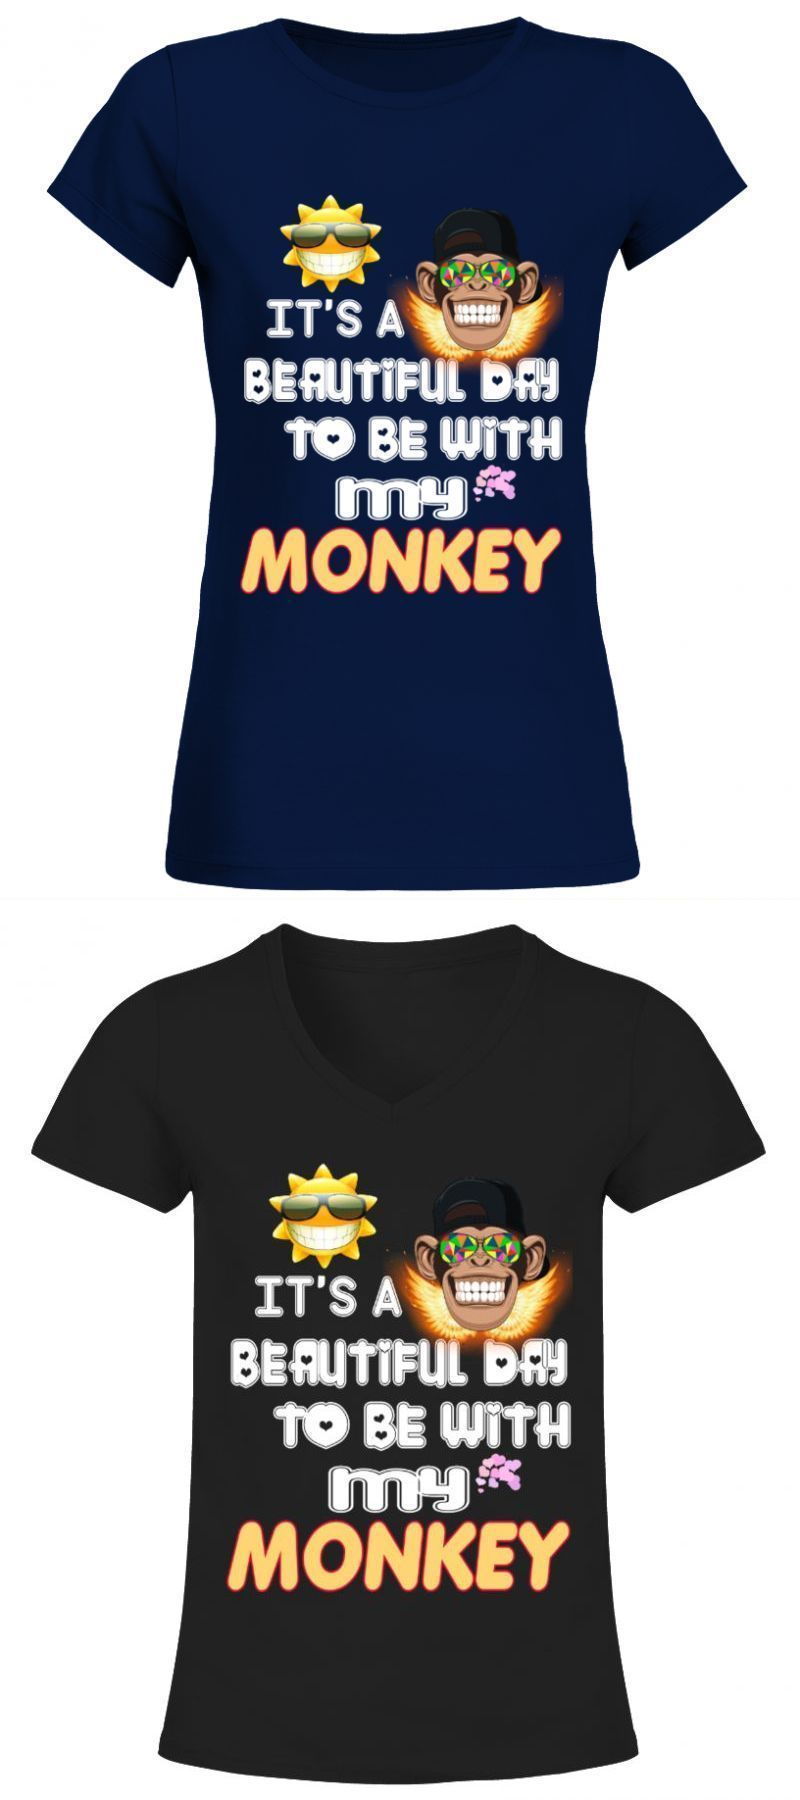 Gas monkey garage t shirt beautiful day with monkey evil monkey t shirt #gasmonkeygarage Gas monkey garage t shirt beautiful day with monkey evil monkey t shirt #gas #monkey #garage #shirt #beautiful #day #with #evil #arctic #monkeys #round #neck #t-shirt #woman #v-neck #gasmonkeygarage Gas monkey garage t shirt beautiful day with monkey evil monkey t shirt #gasmonkeygarage Gas monkey garage t shirt beautiful day with monkey evil monkey t shirt #gas #monkey #garage #shirt #beautiful #day #with # #gasmonkeygarage